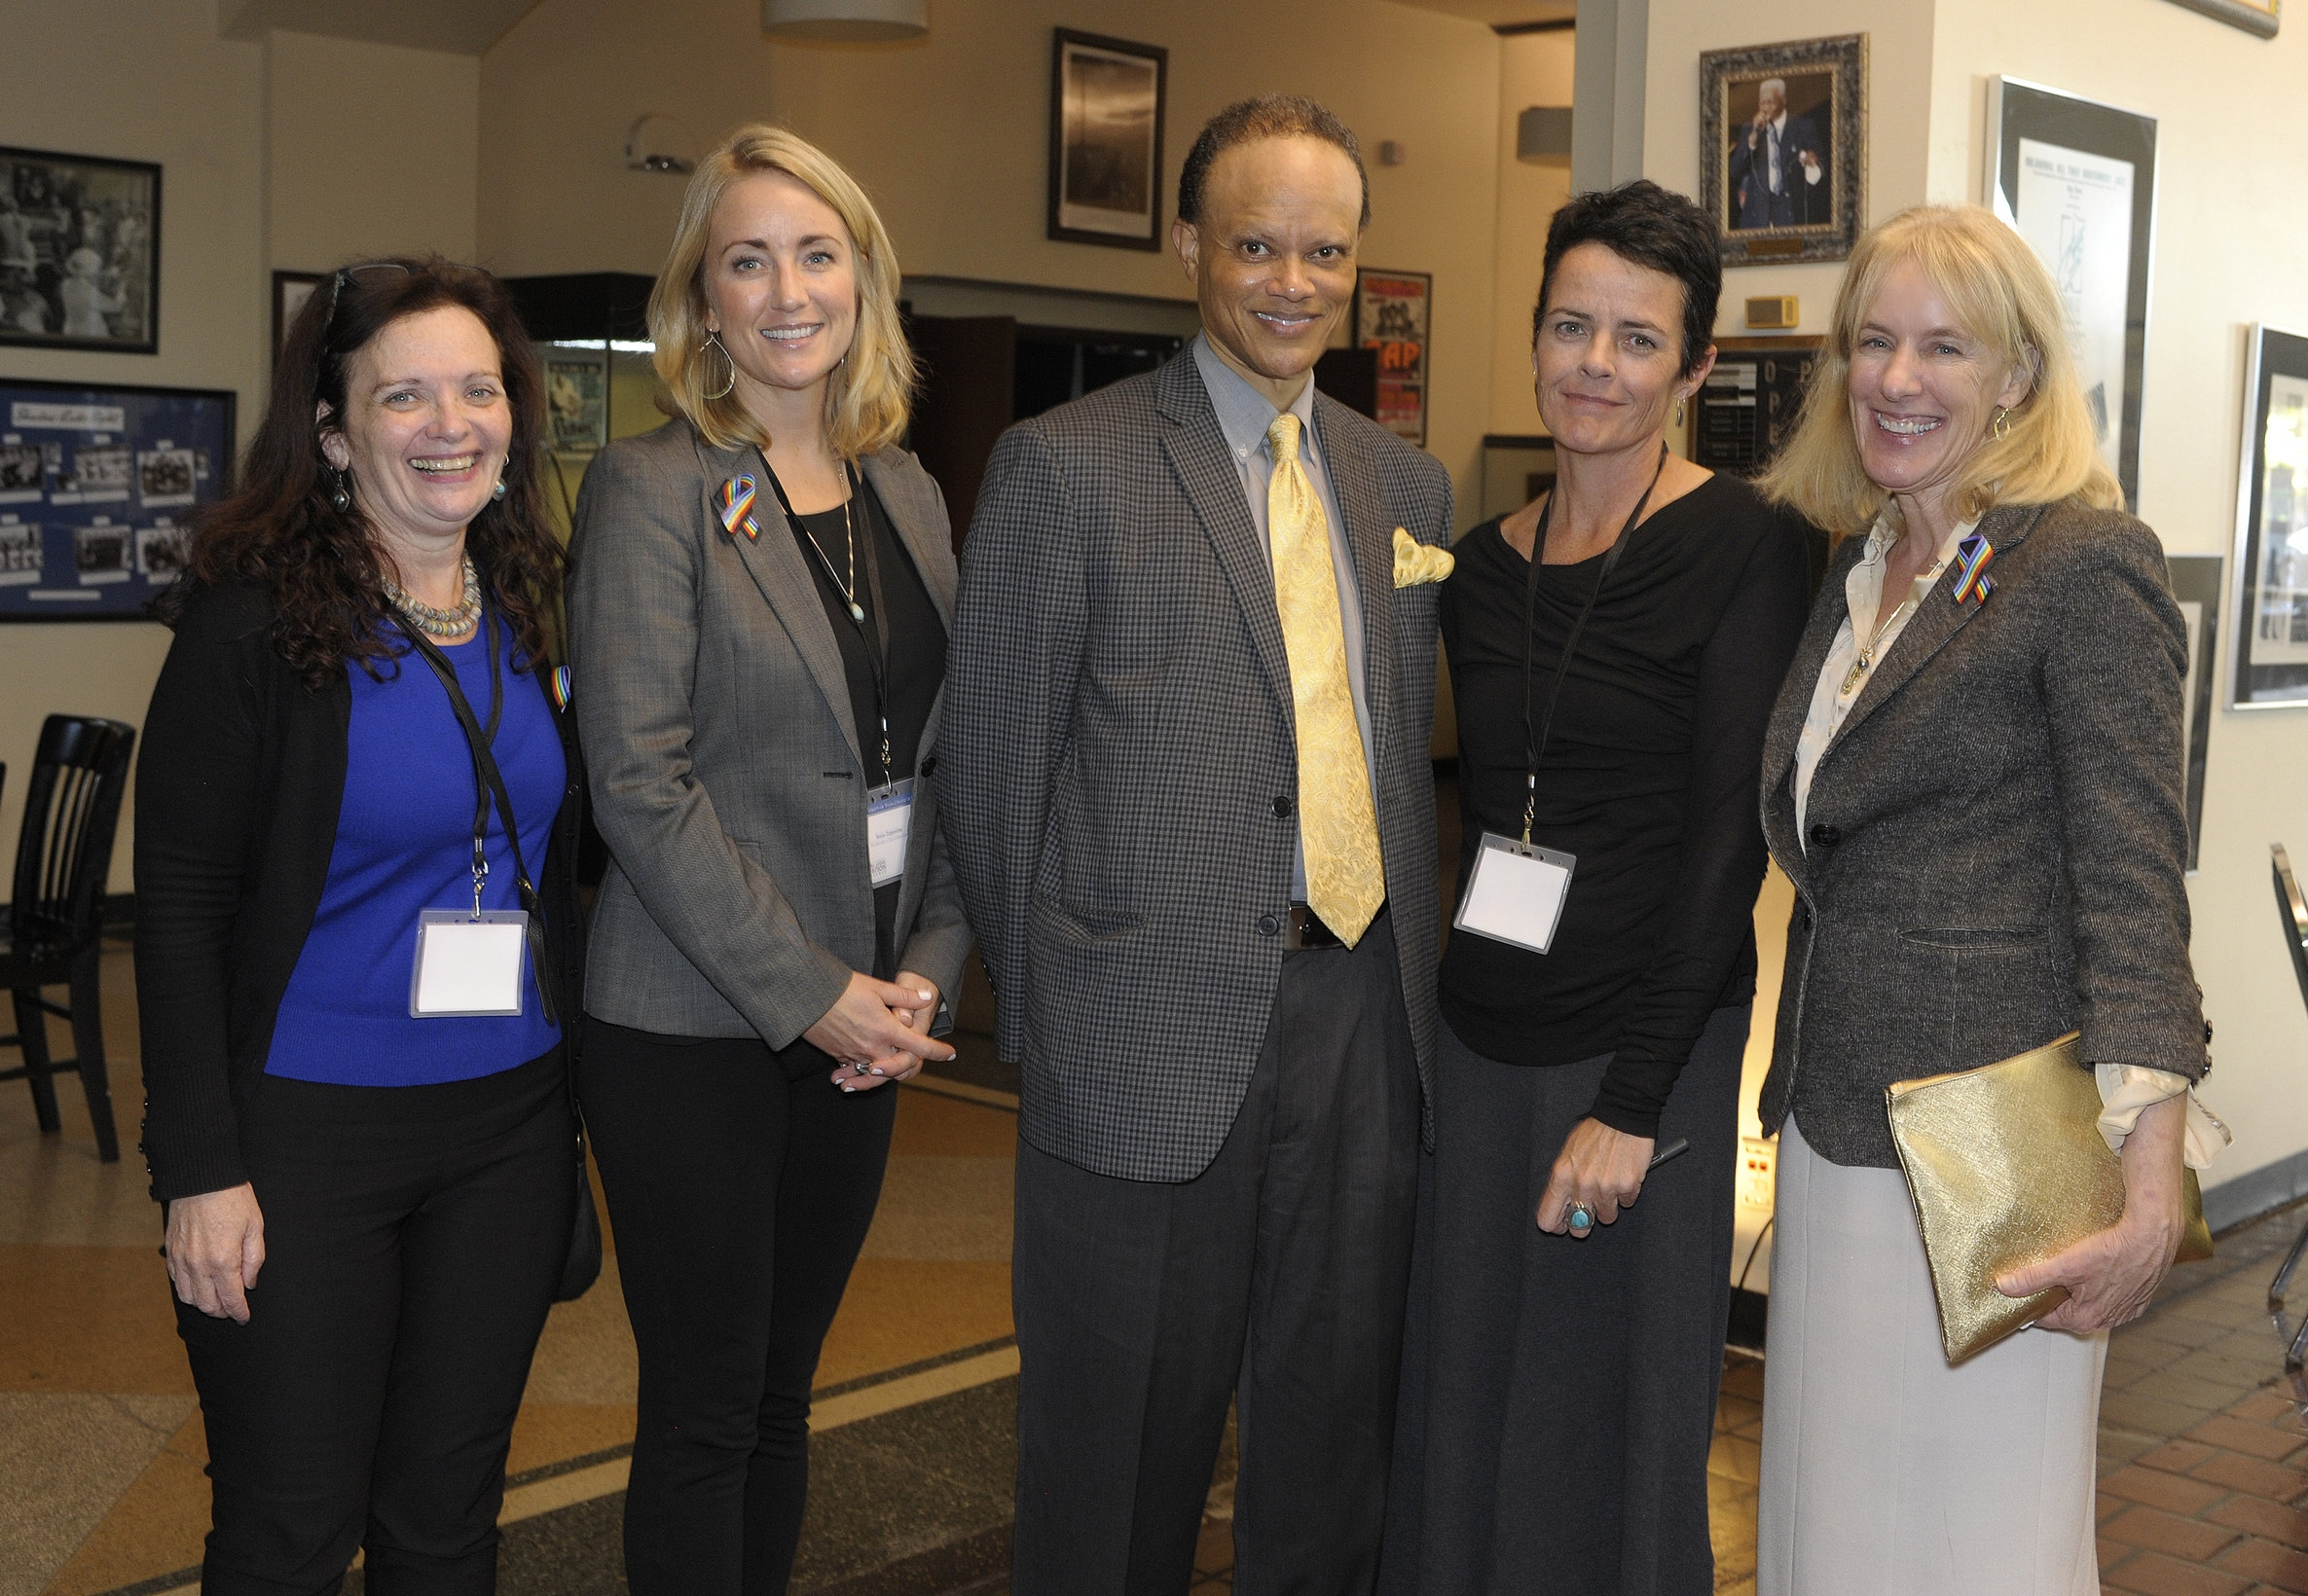 From left: Professor Miriam Marton, Professor Anna Carpenter, Hannibal B. Johnson, Professor Elizabeth McCormick, Dean Lyn Entzeroth